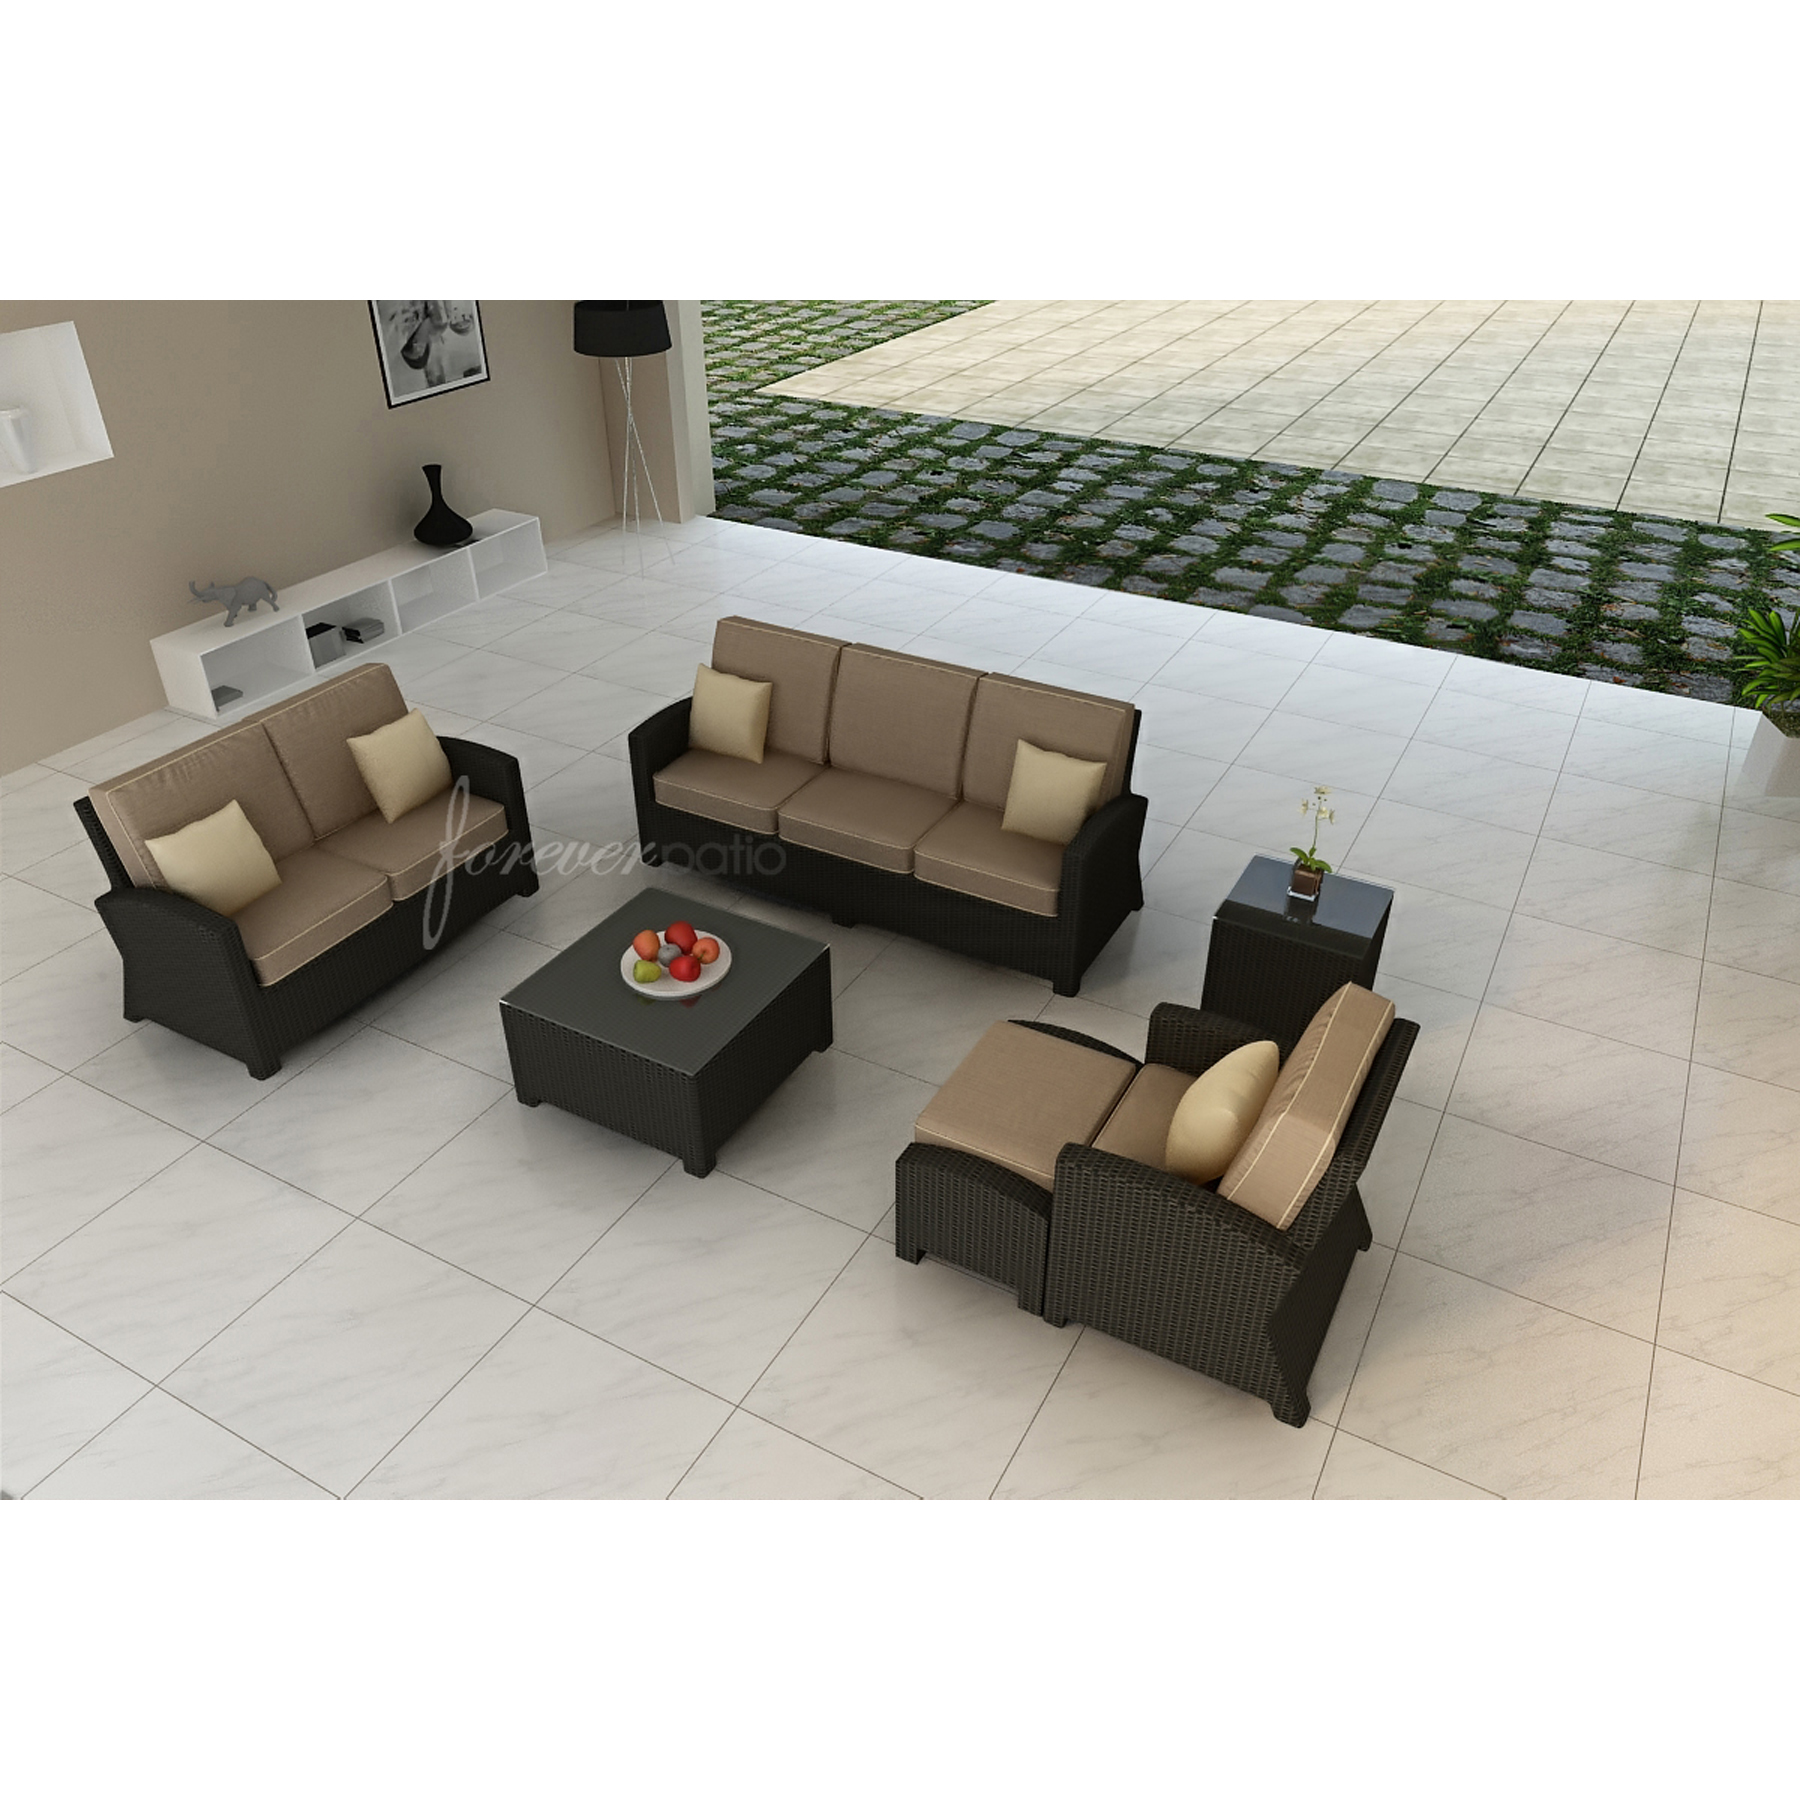 sunbrella fabric sectional sofas sofa sets online vijayawada forever patio barbados 6pc set featuring